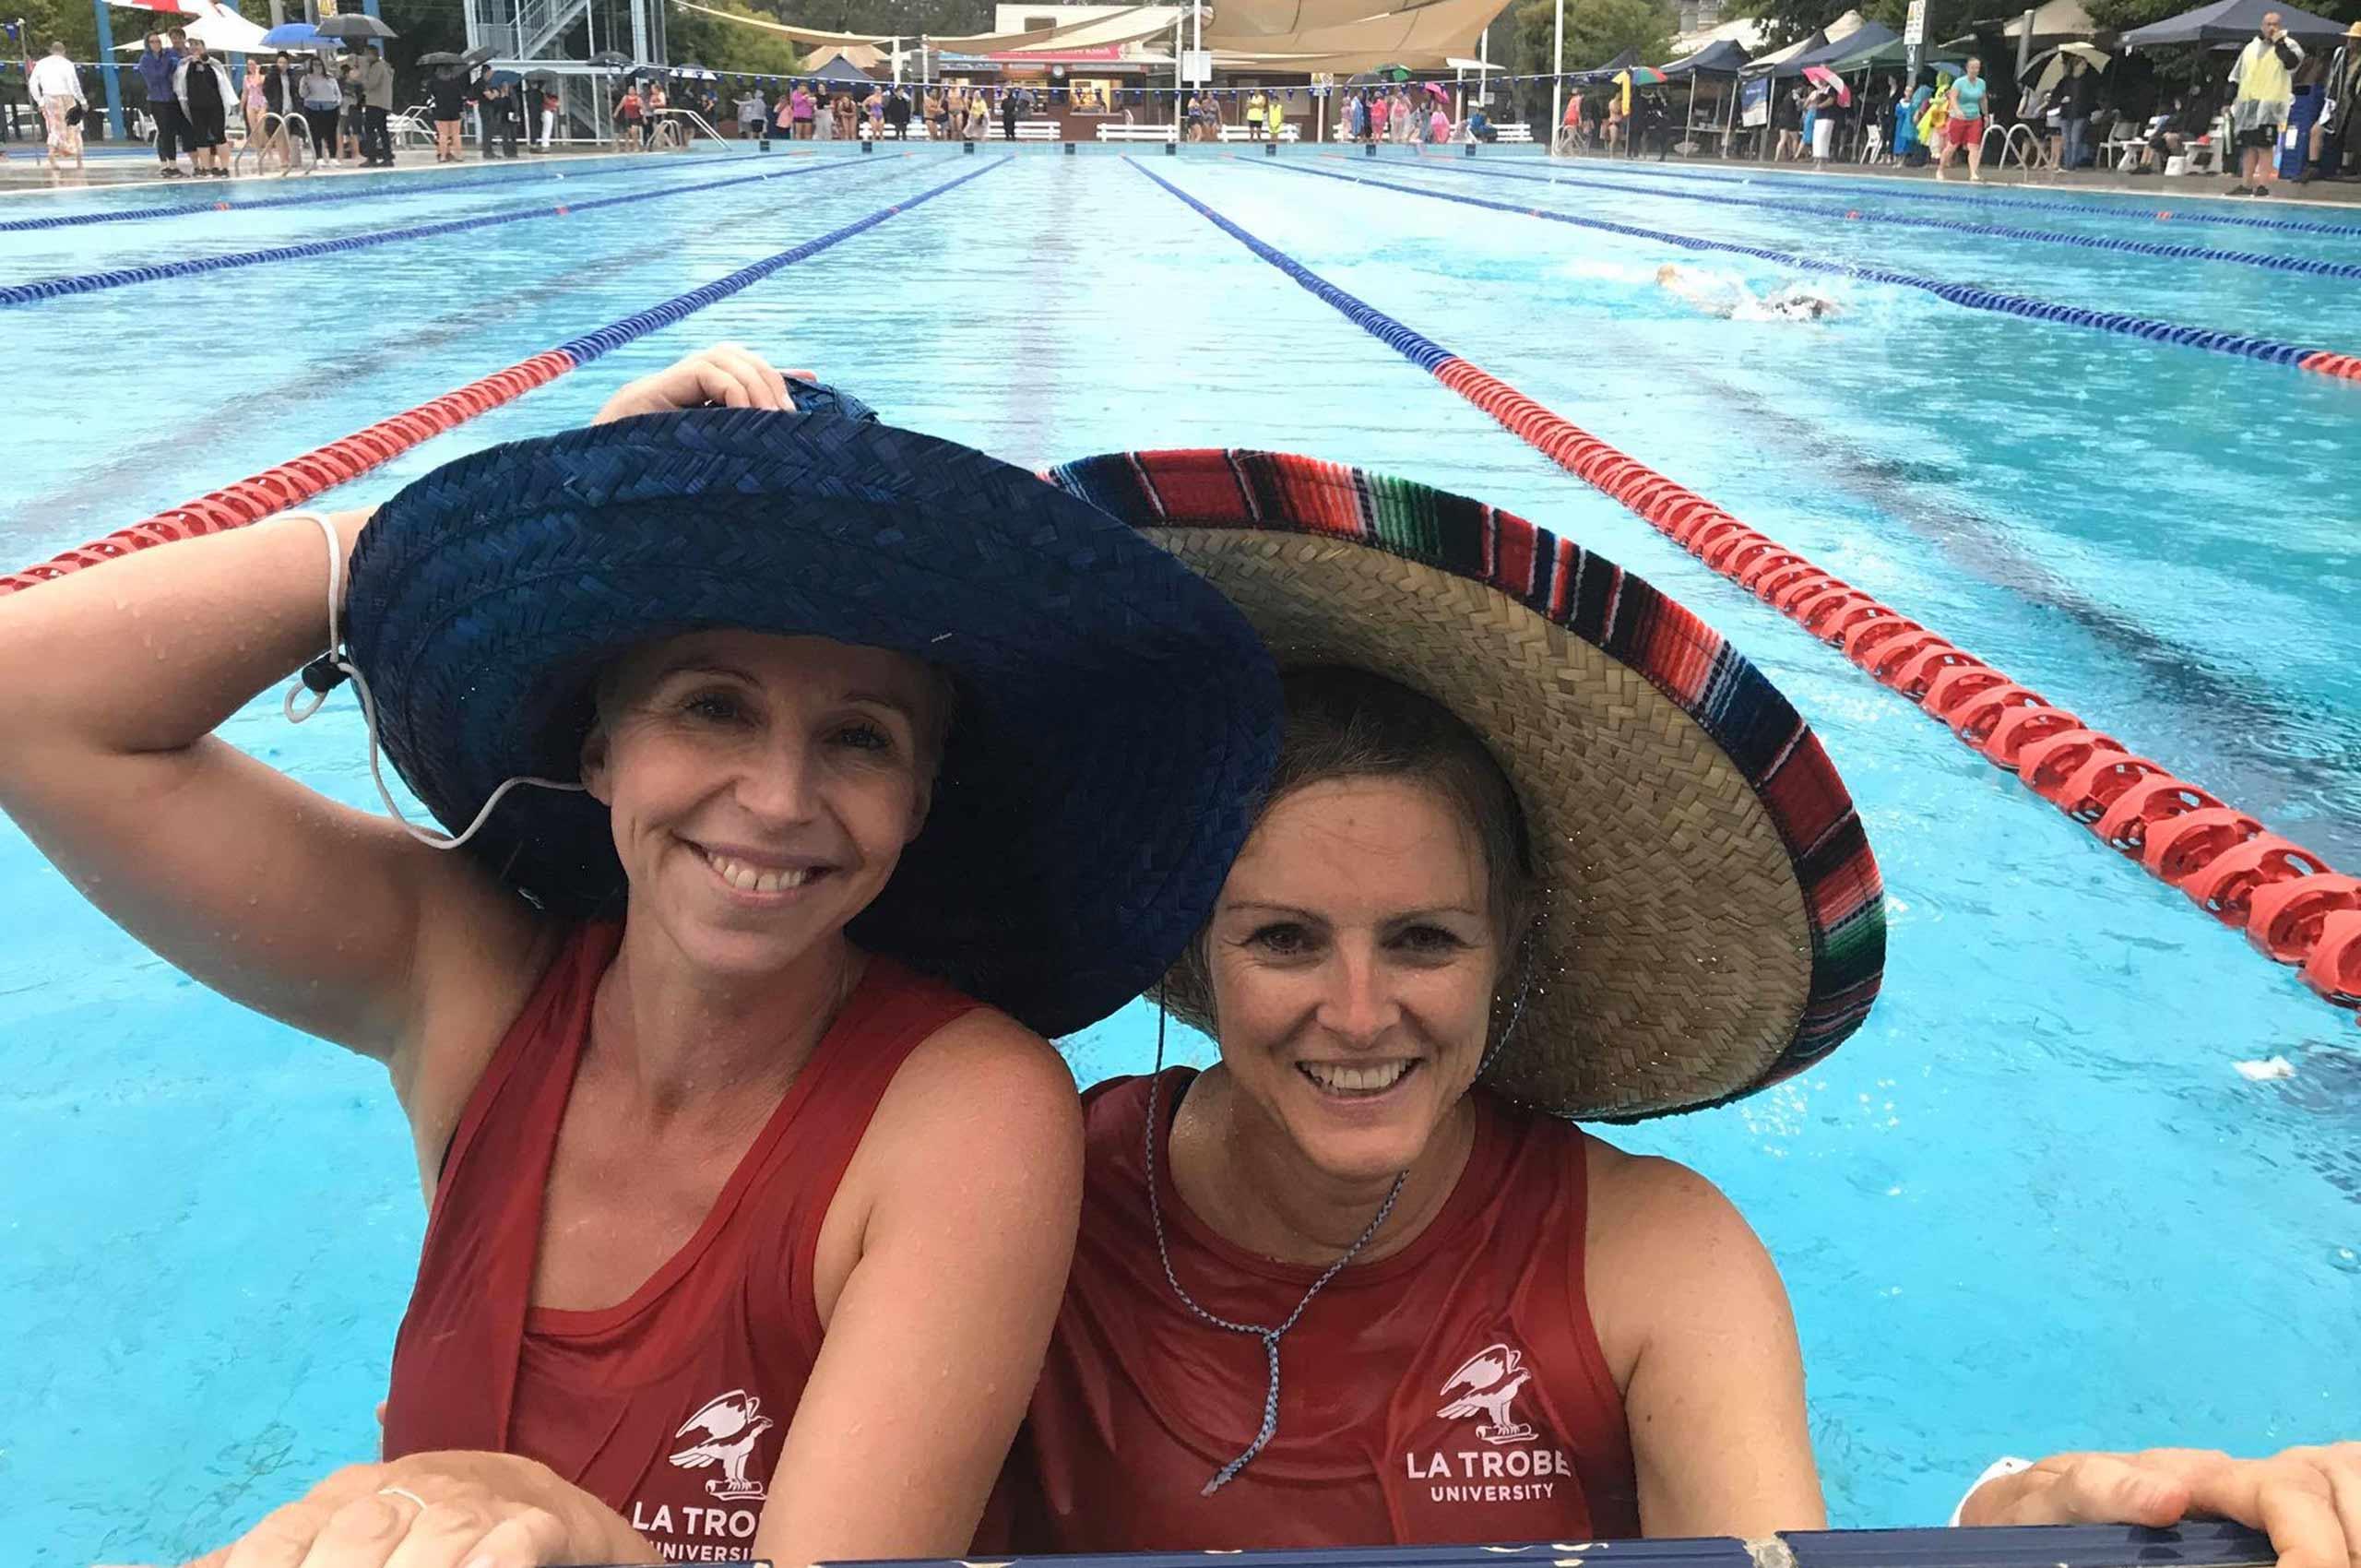 Two women in a swimming pool.